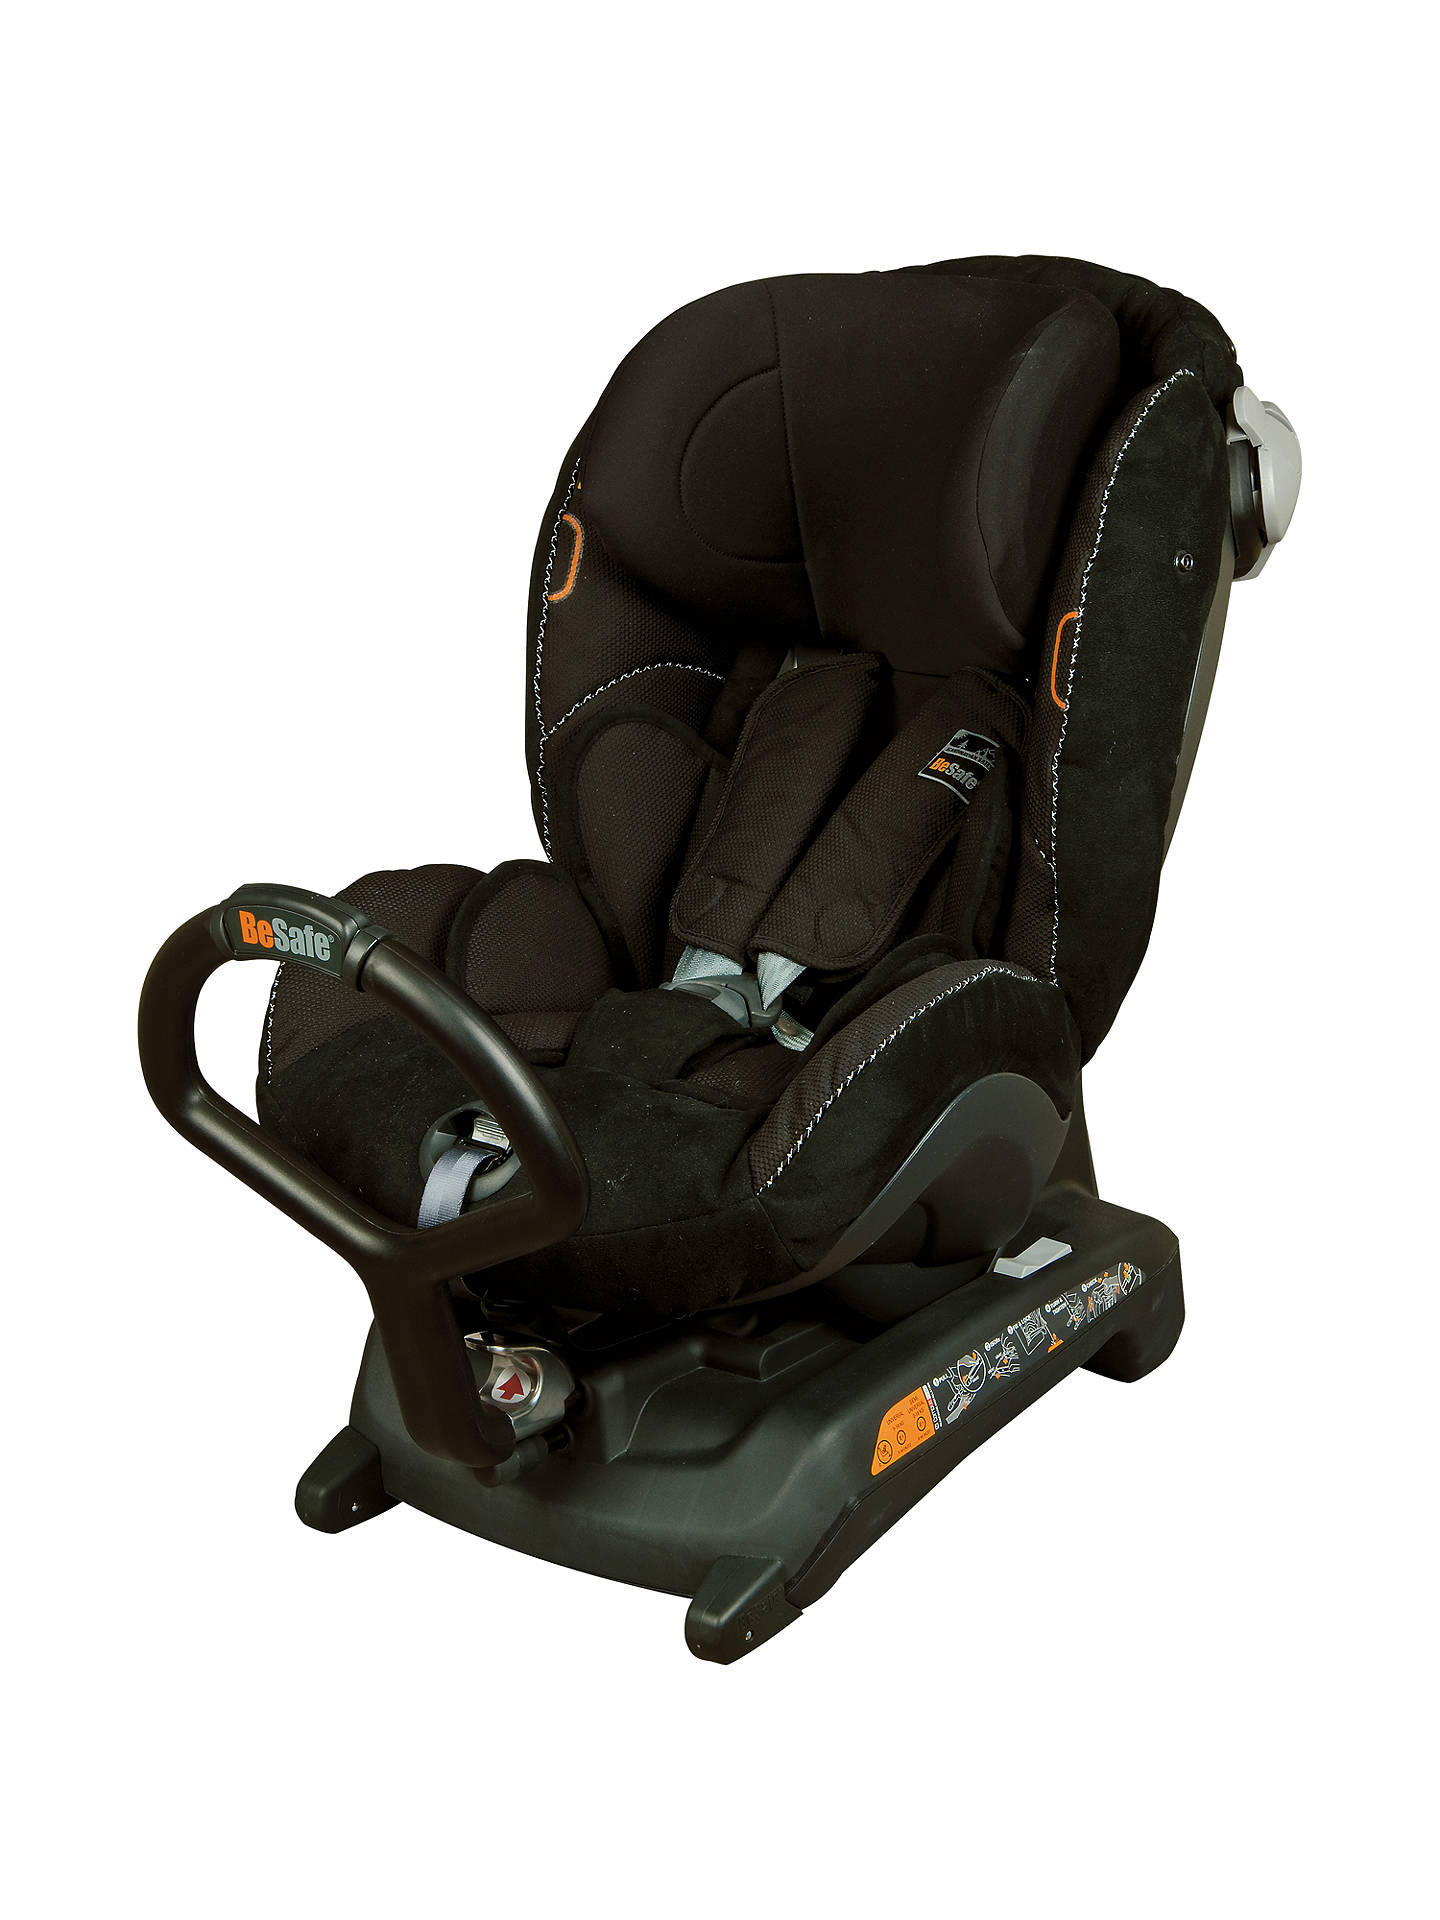 besafe izi combi x3 isofix car seat black alcantara at john lewis partners